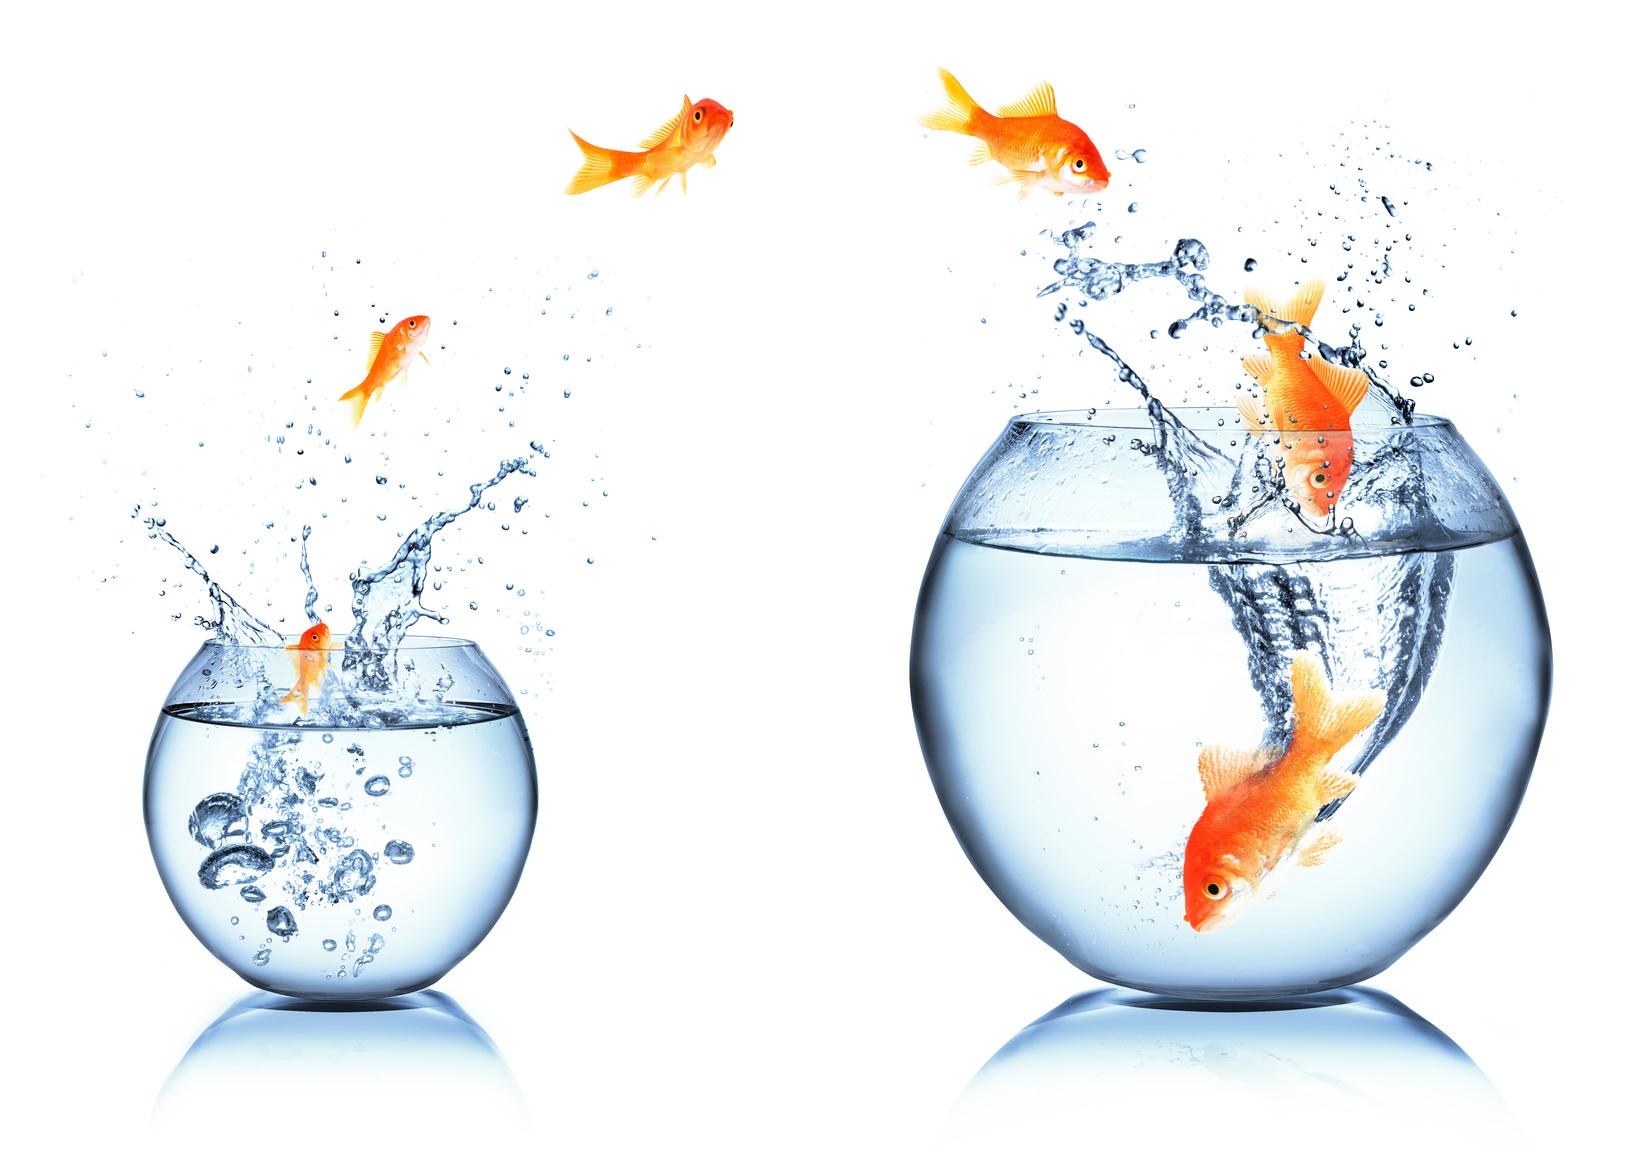 Changement d'aquarium